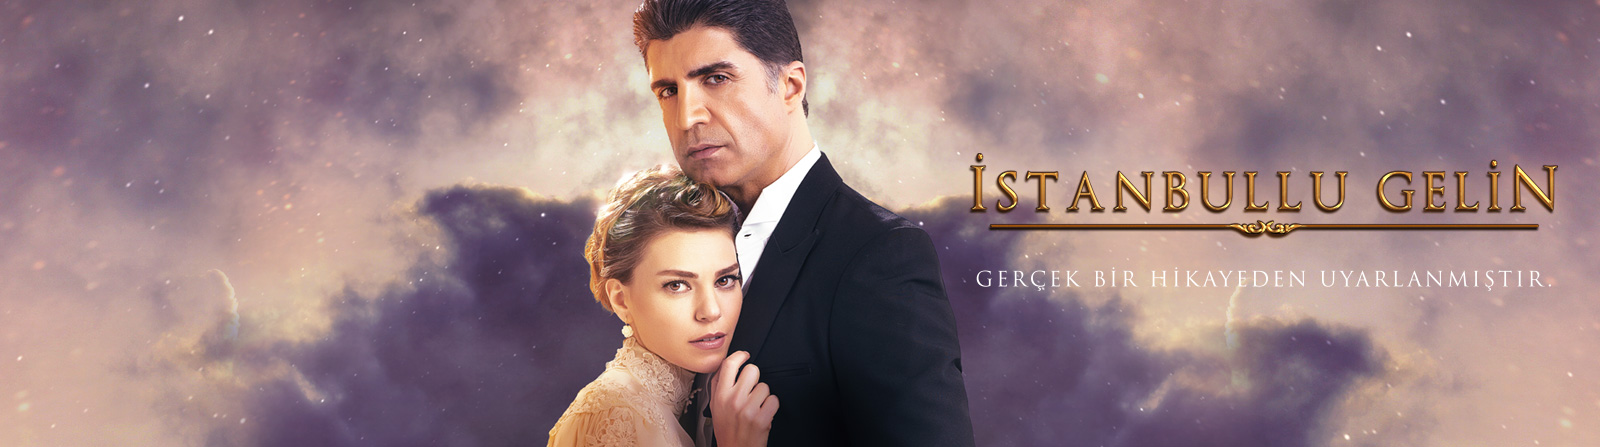 Mireasa din Istanbul episodul 18